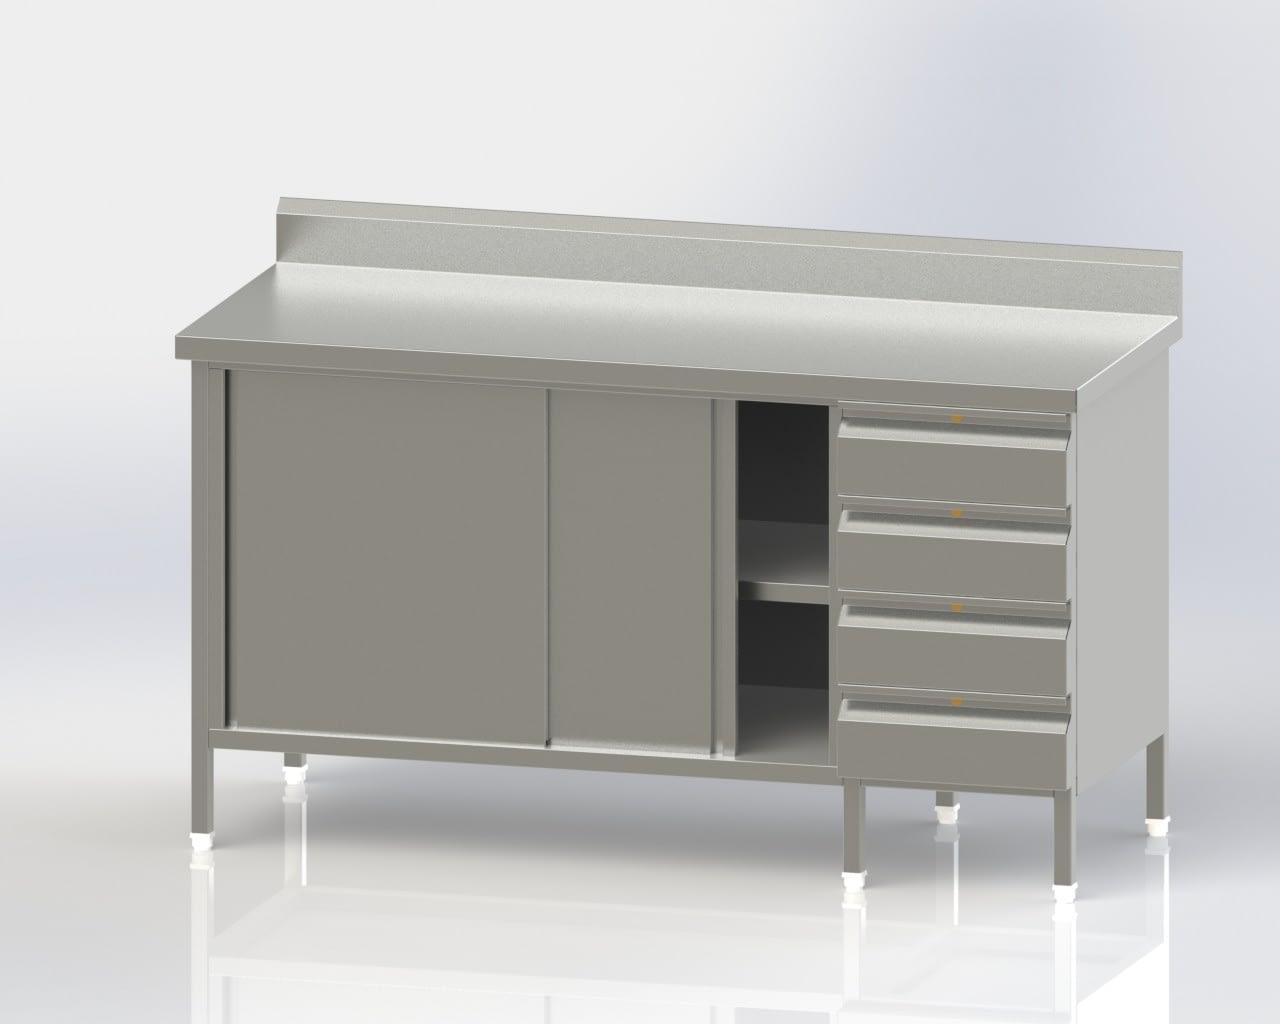 Work Table/Cup Board/Intermediate Shelf/$ Drawers